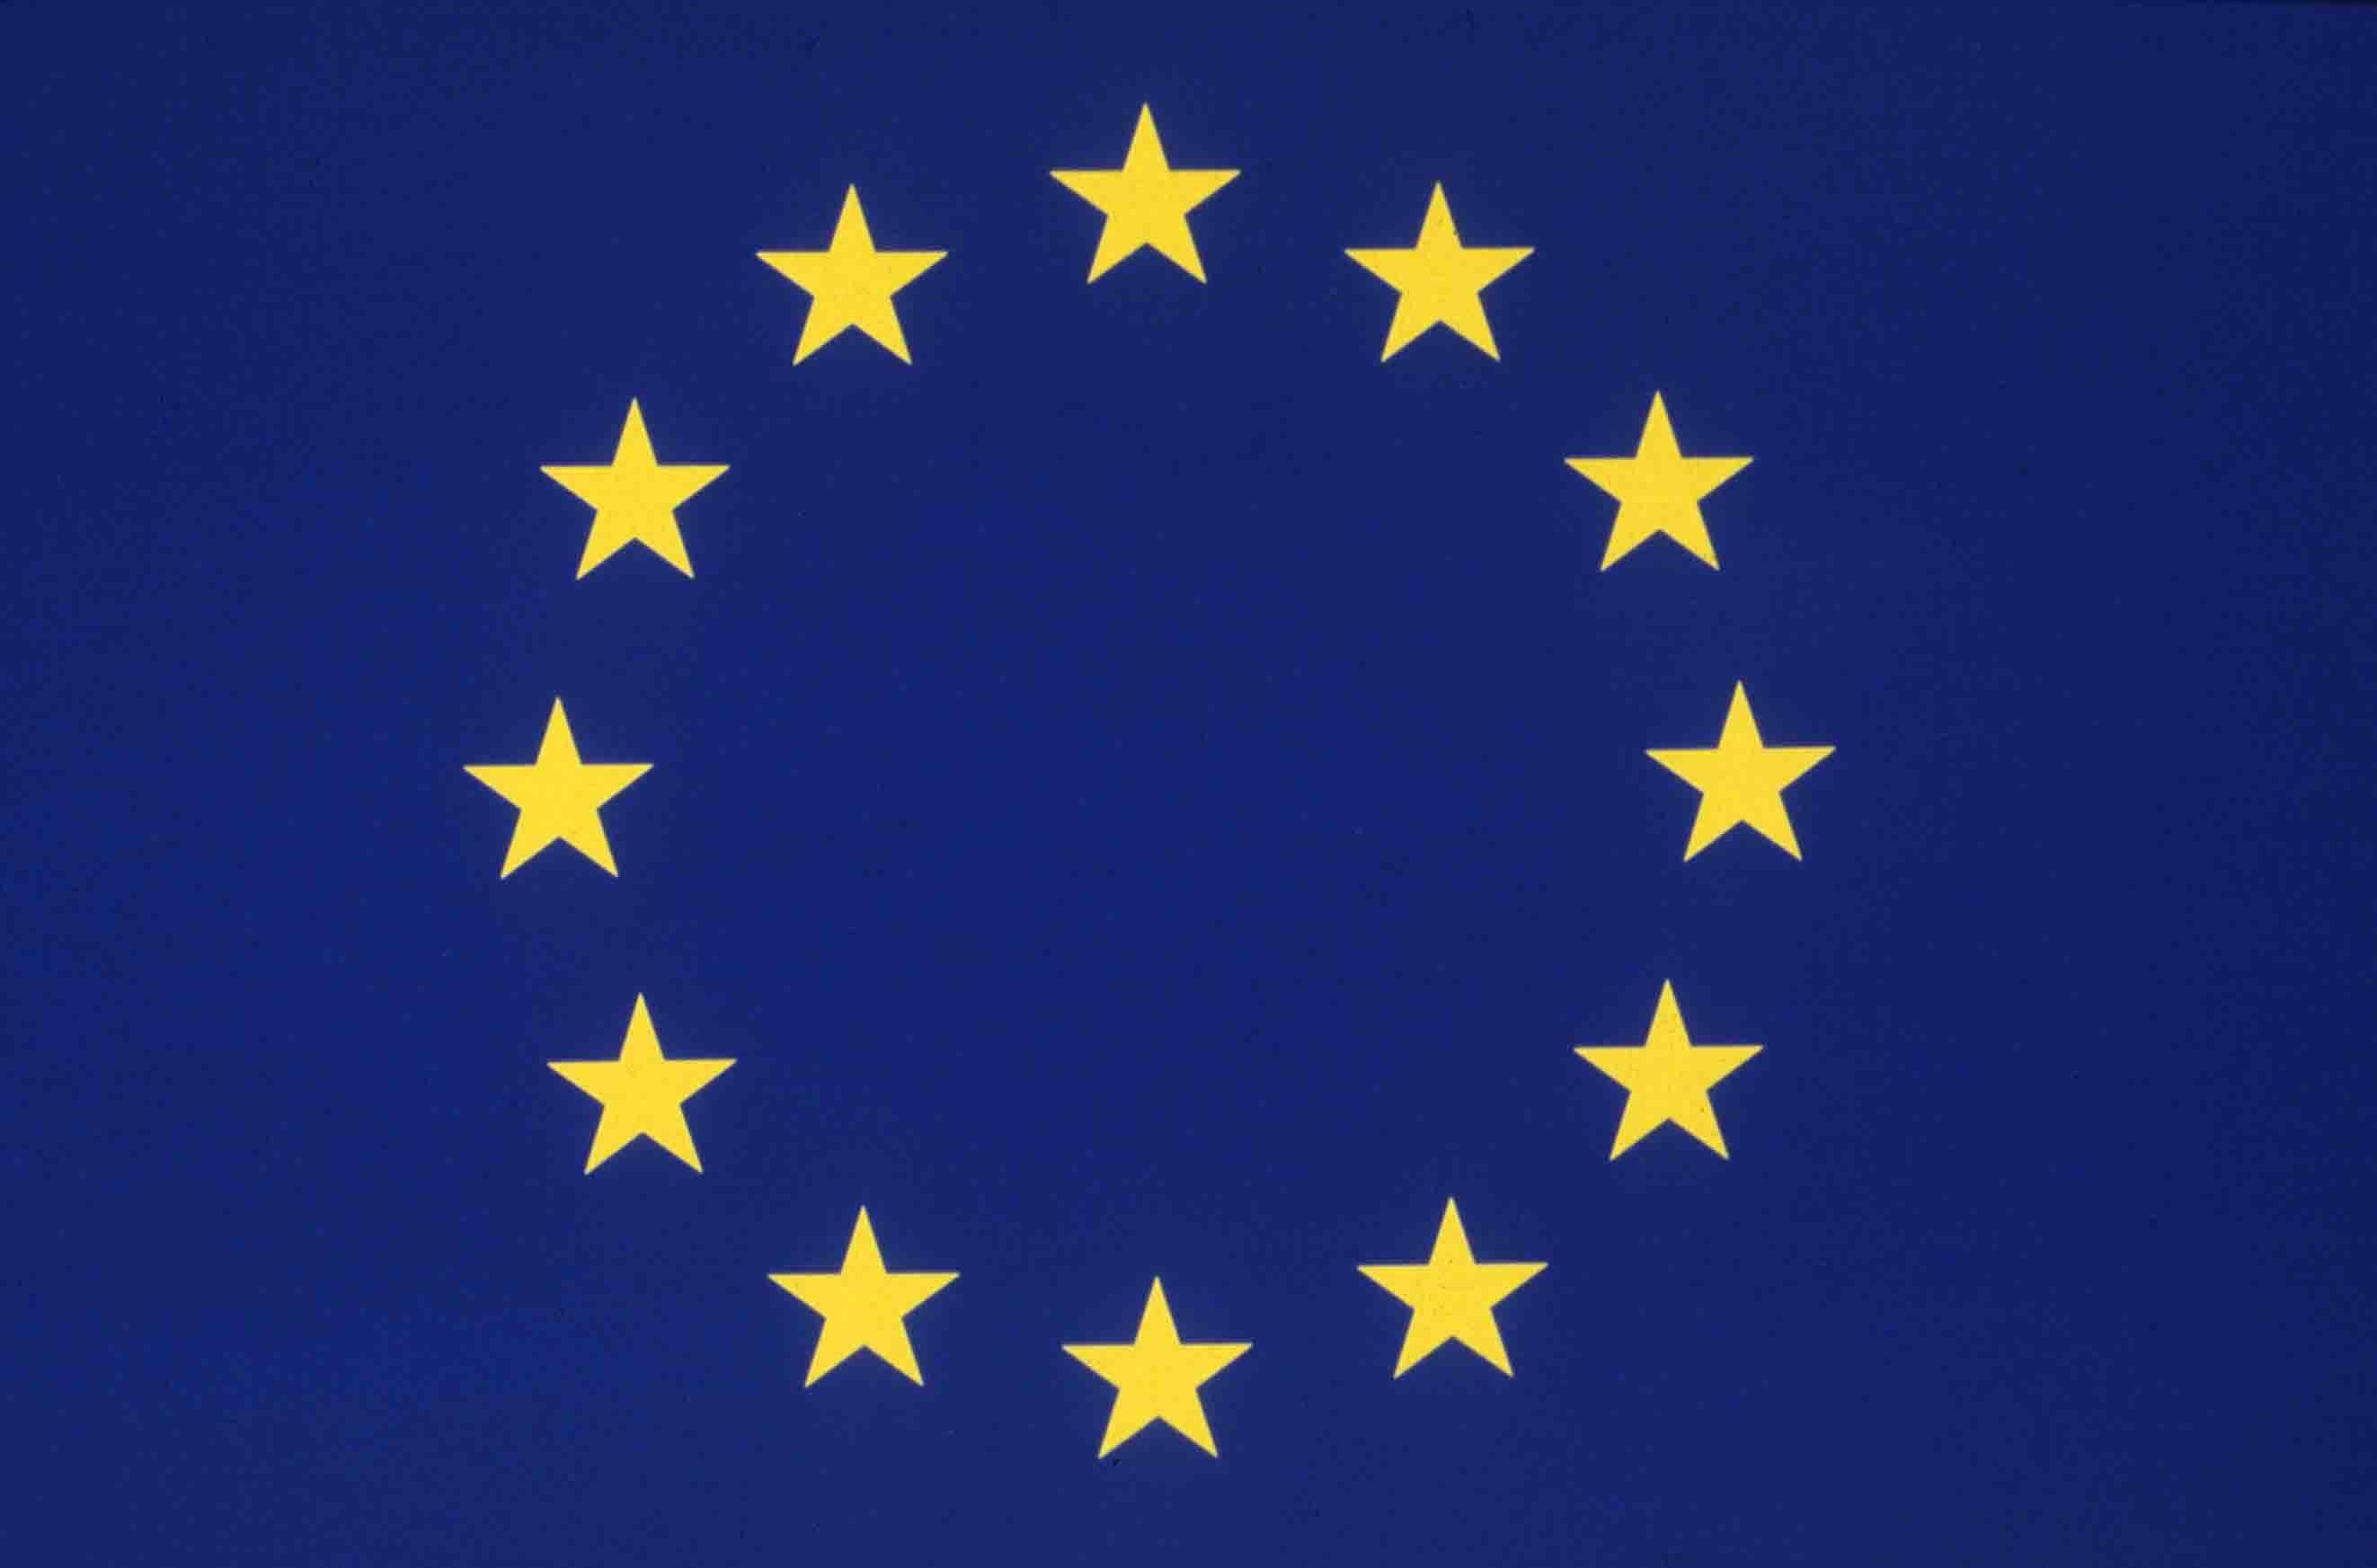 European Union Flags HD Wallpaper Background Image 2645x1745 2645x1745